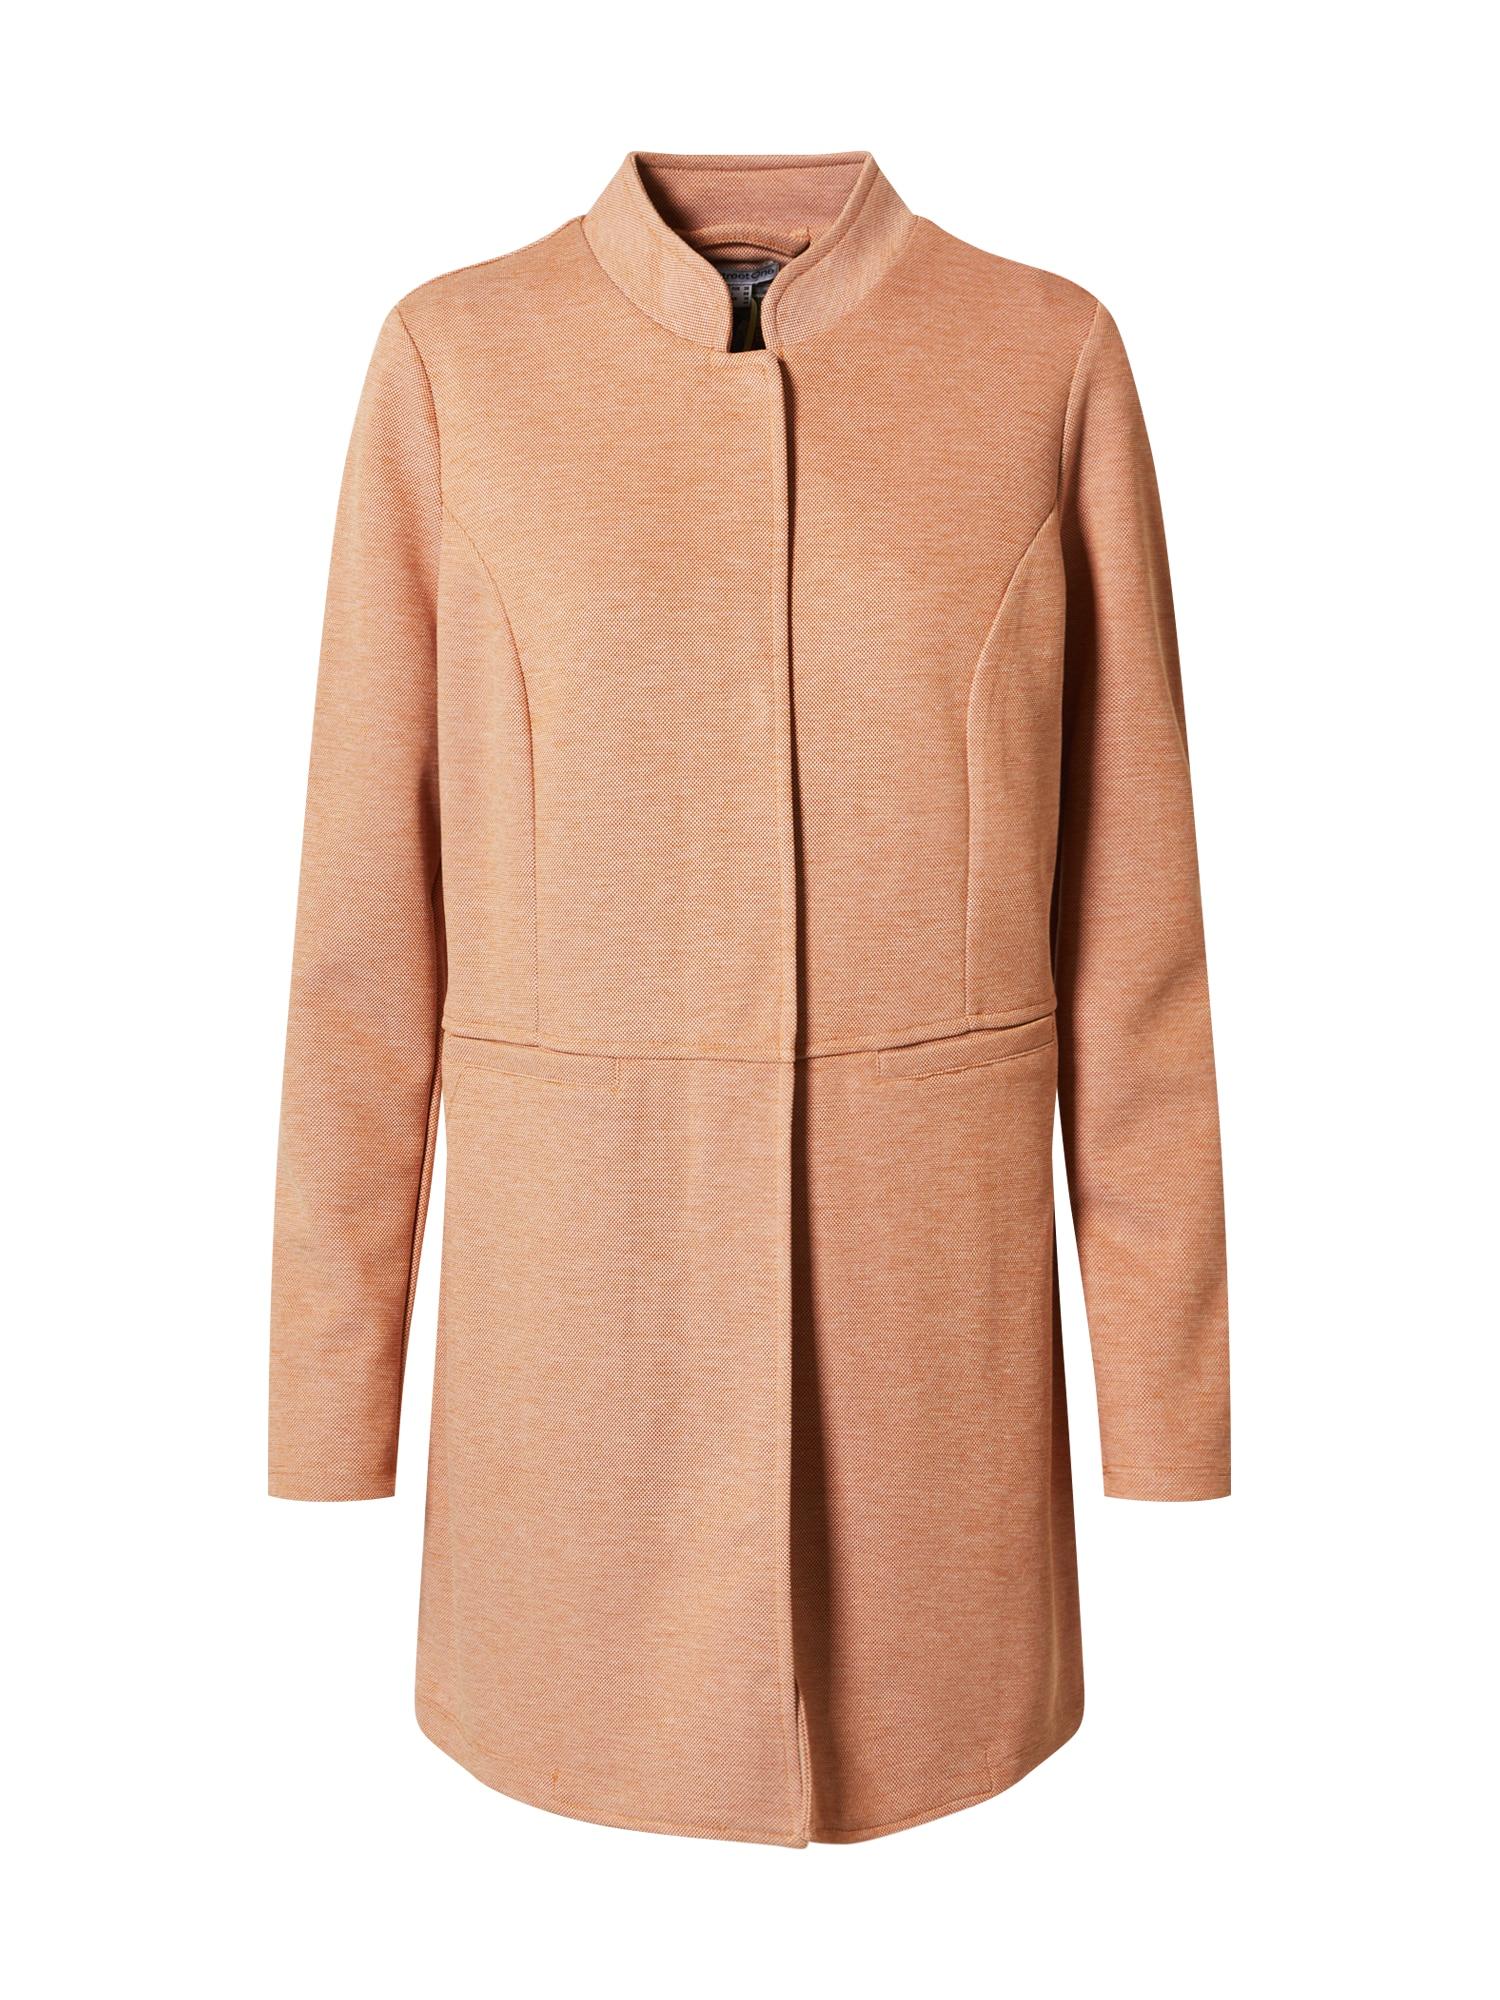 STREET ONE Demisezoninis paltas margai oranžinė